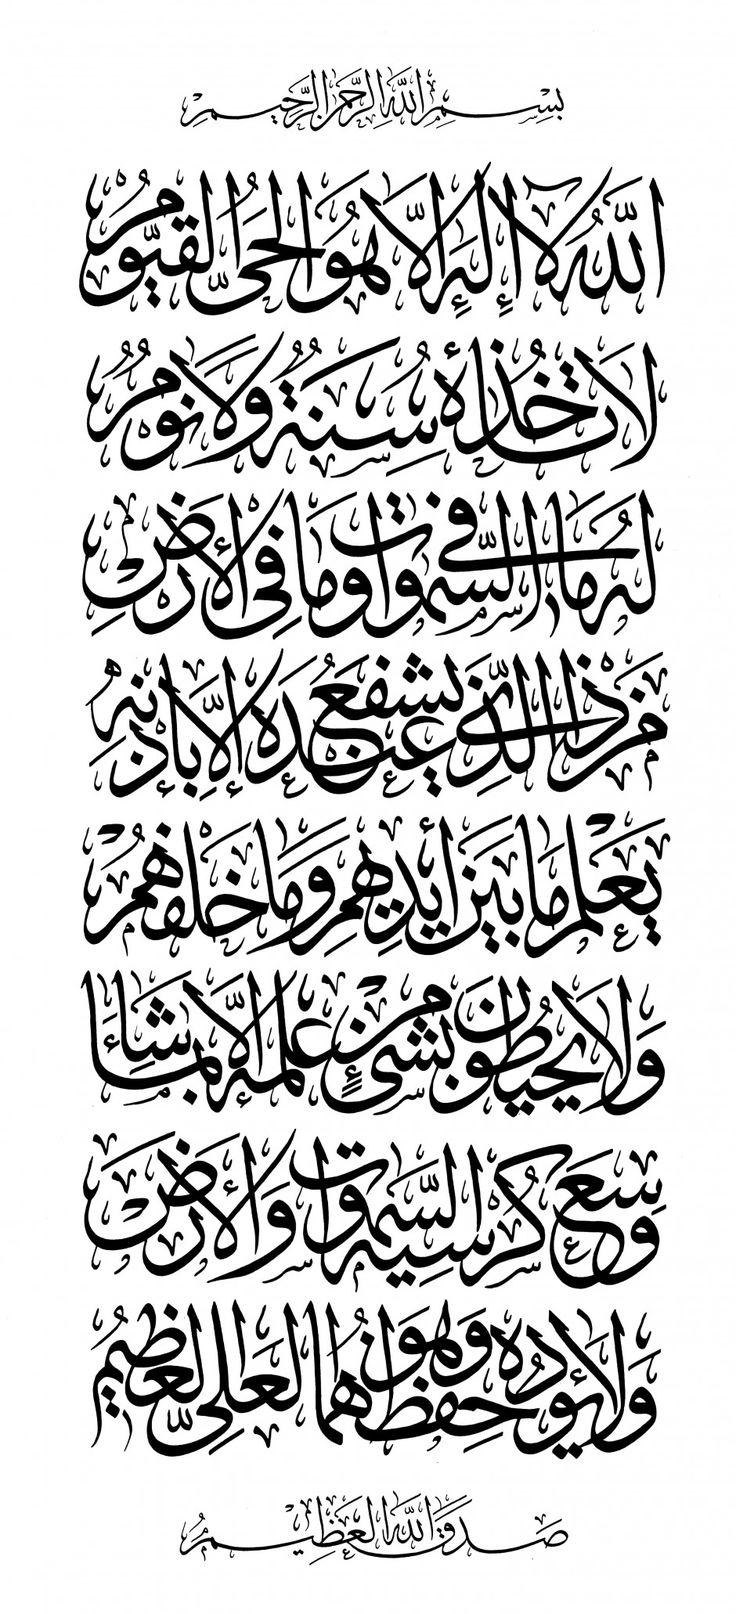 Al-Baqarah 2, 255 / Ayet el-kursi